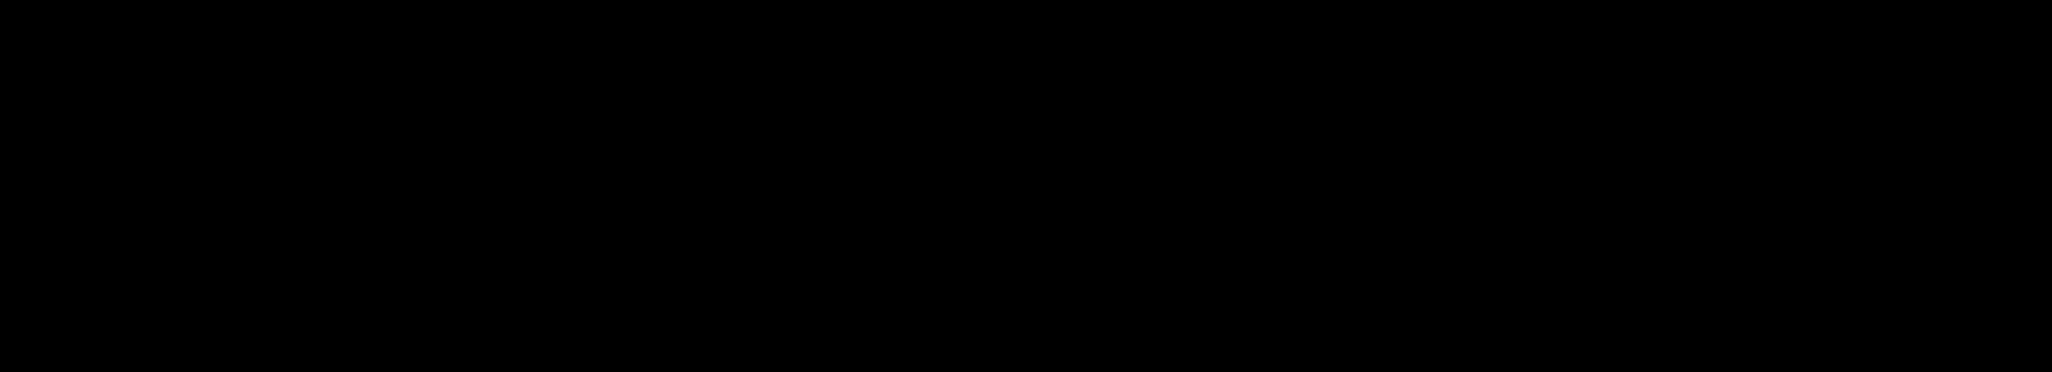 fast company logo.png